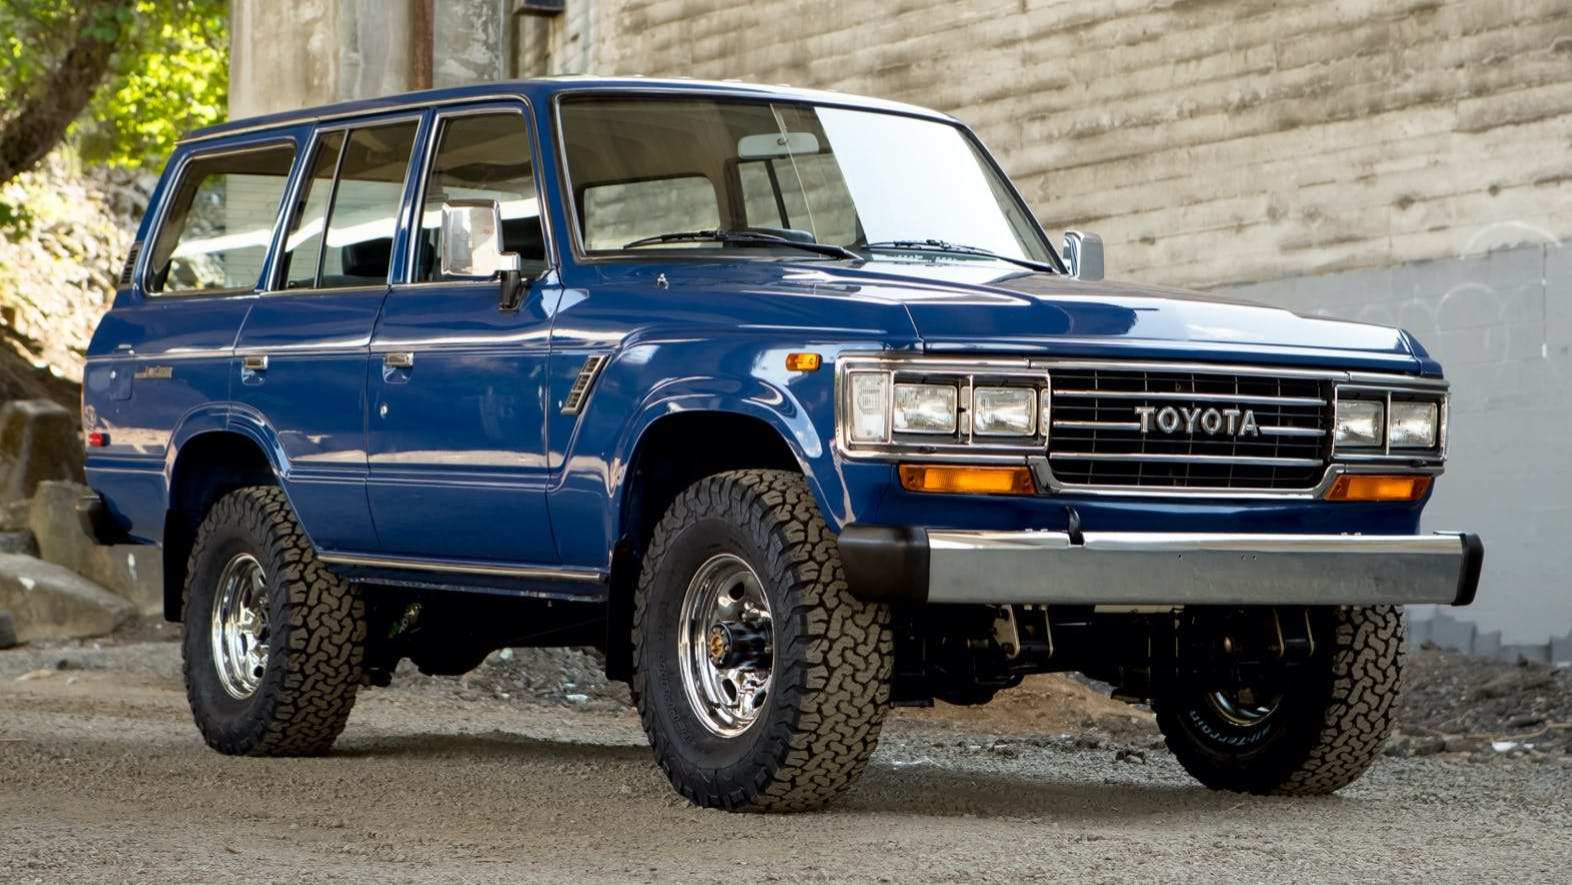 Kelebihan Kekurangan Toyota Land Cruiser 1988 Tangguh